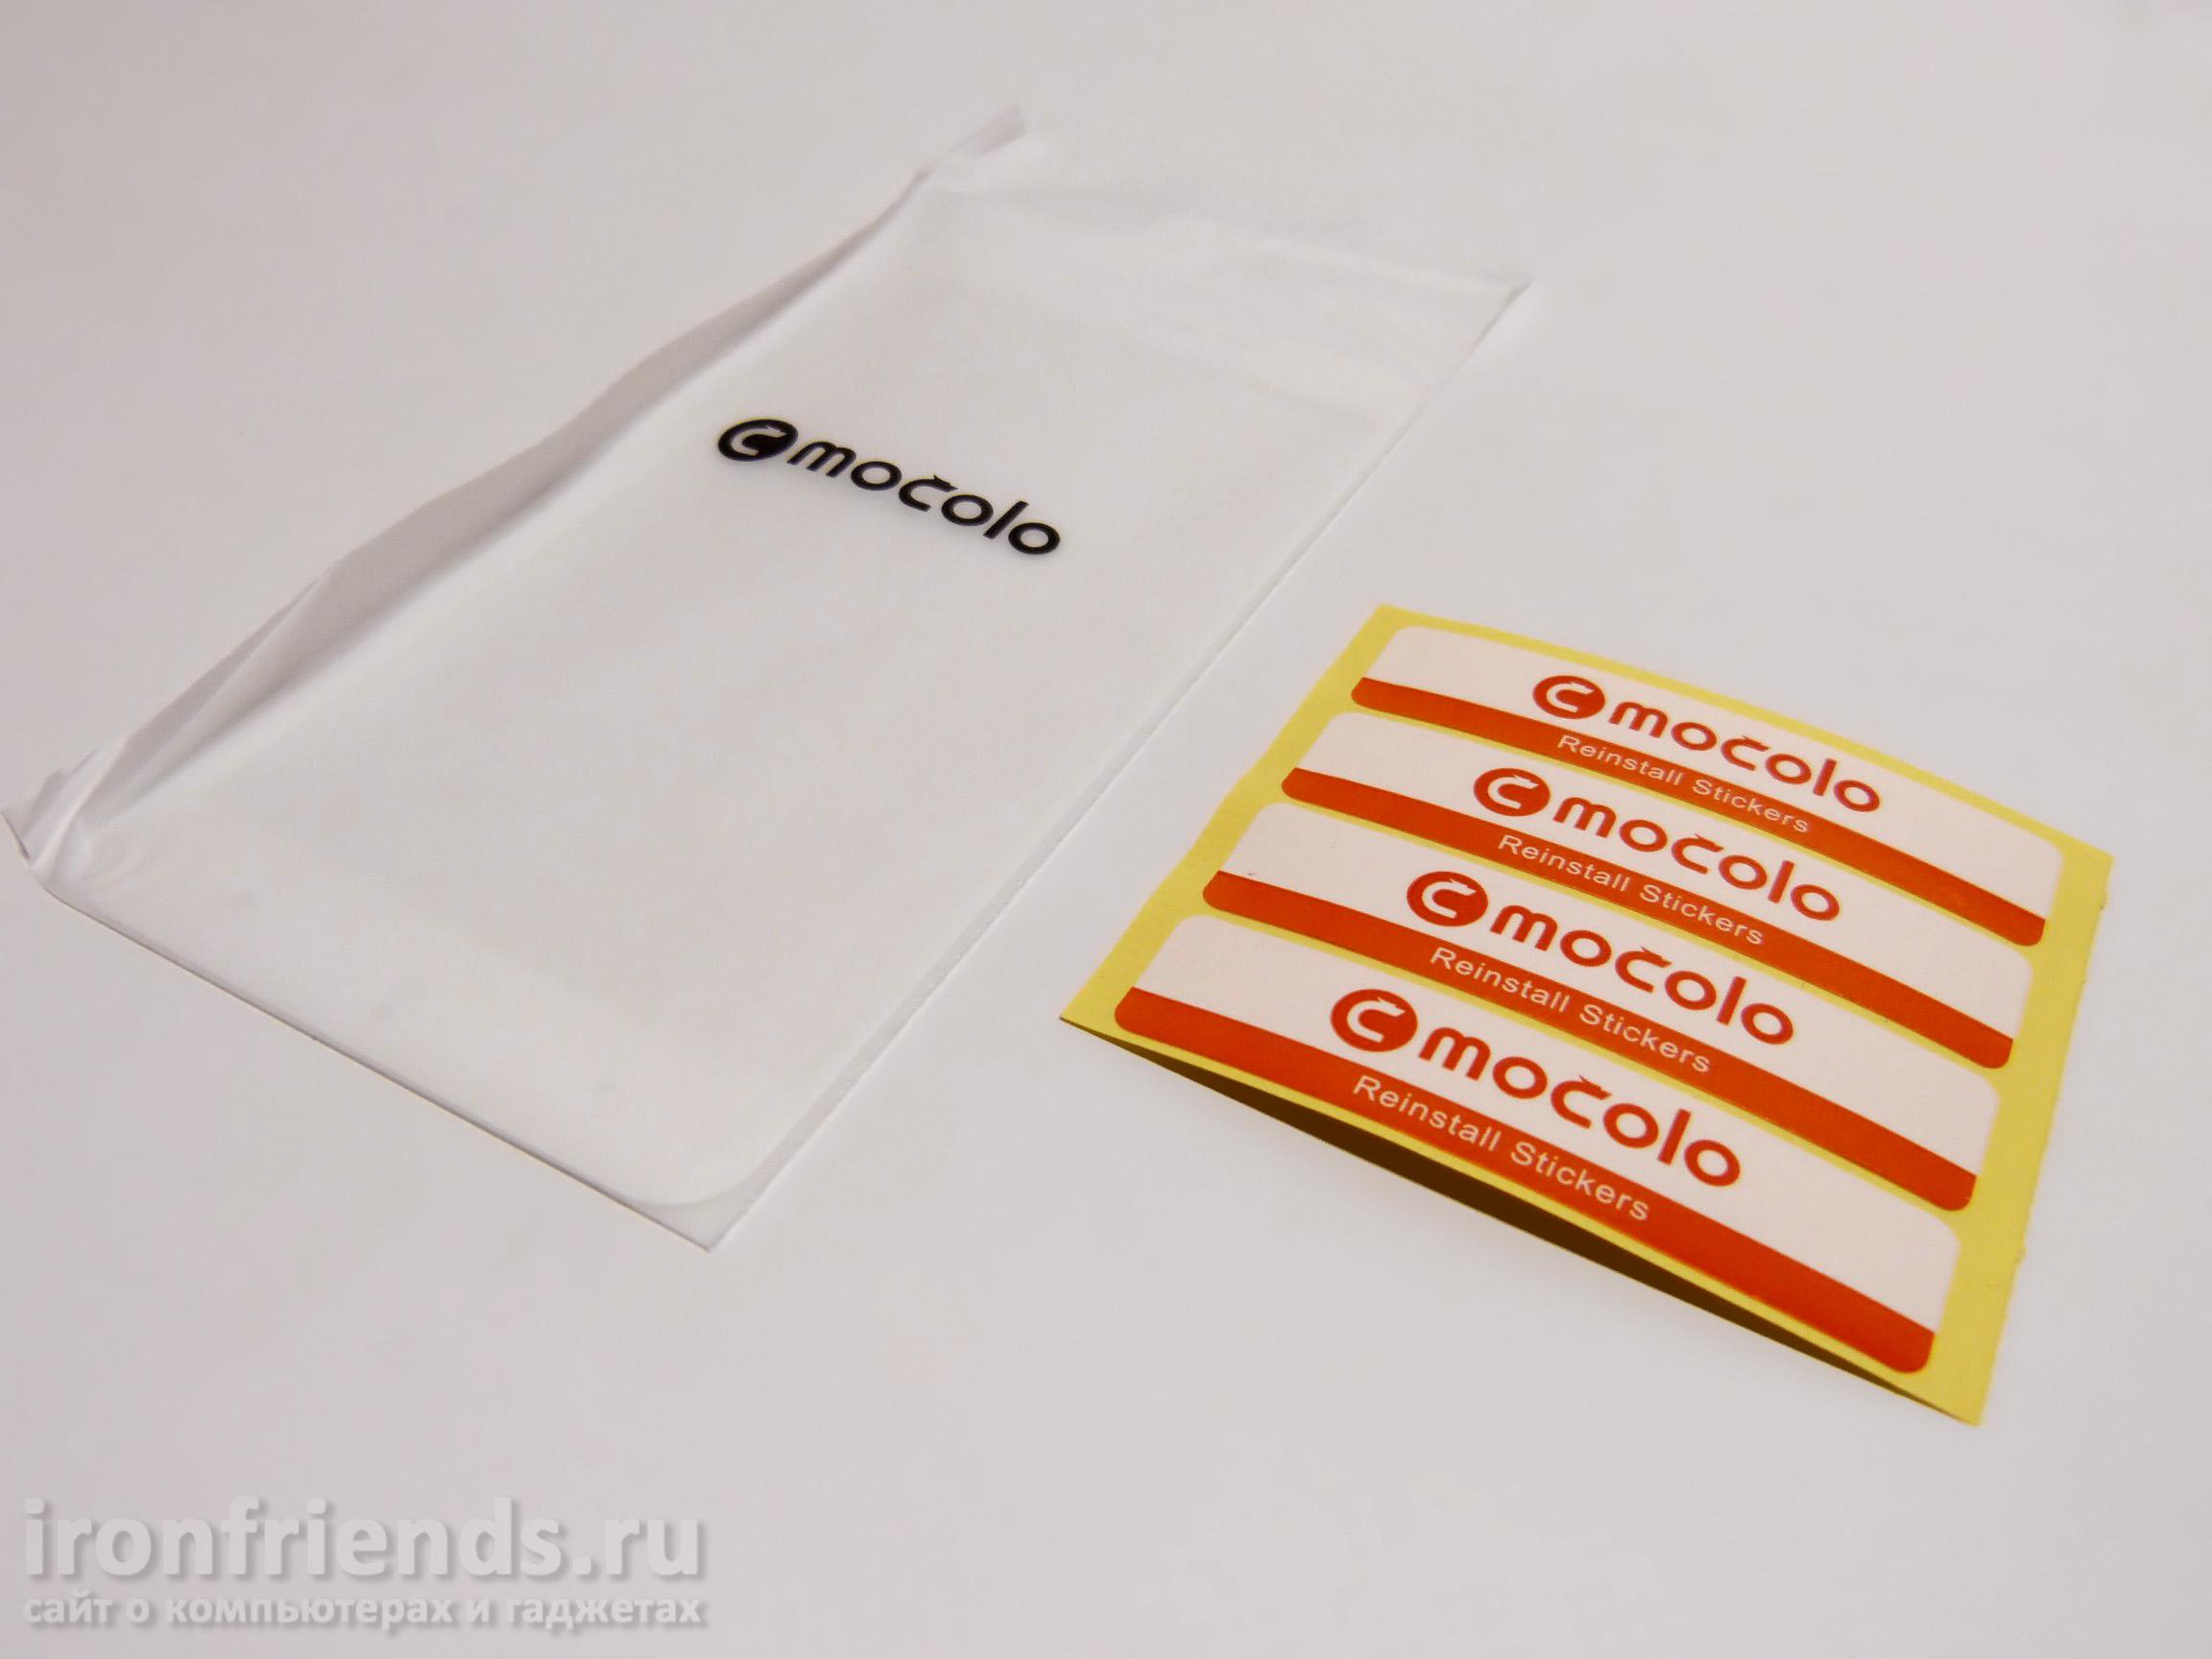 Комплектация Mocolo для Xiaomi Redmi 4X